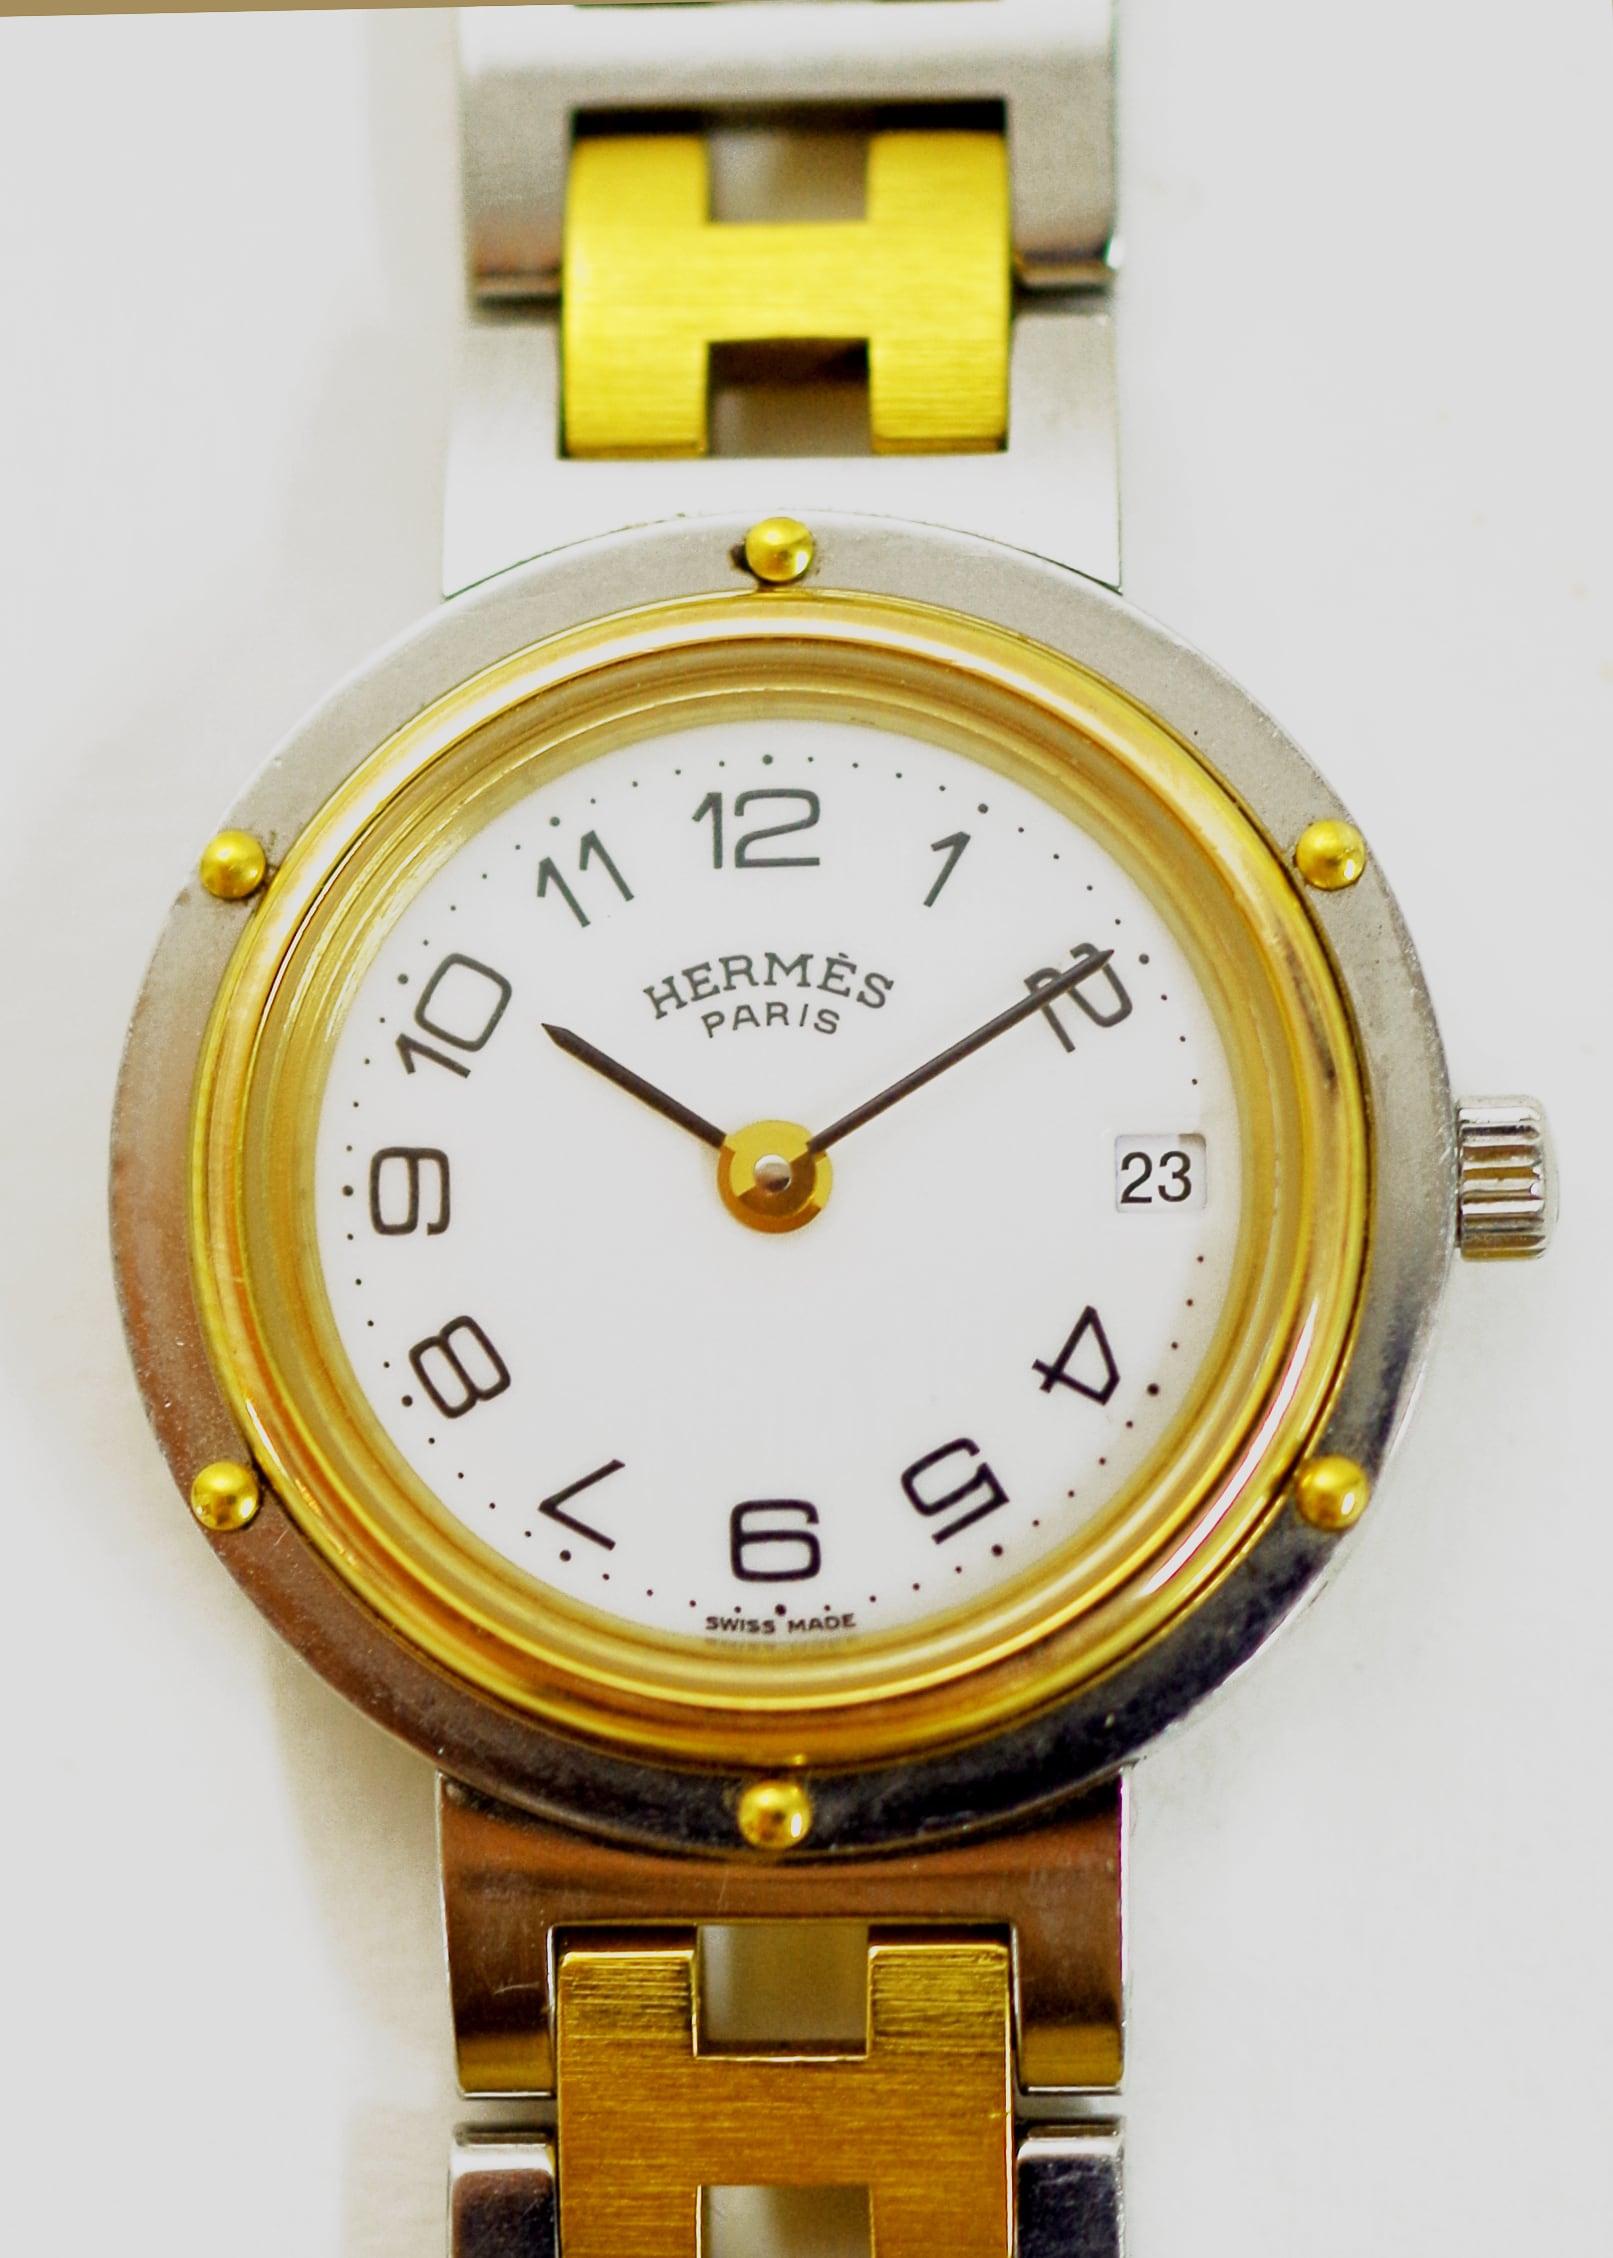 HERMES エルメス クリッパー 旧タイプ コンビ クオーツ ホワイト 腕時計 レディース